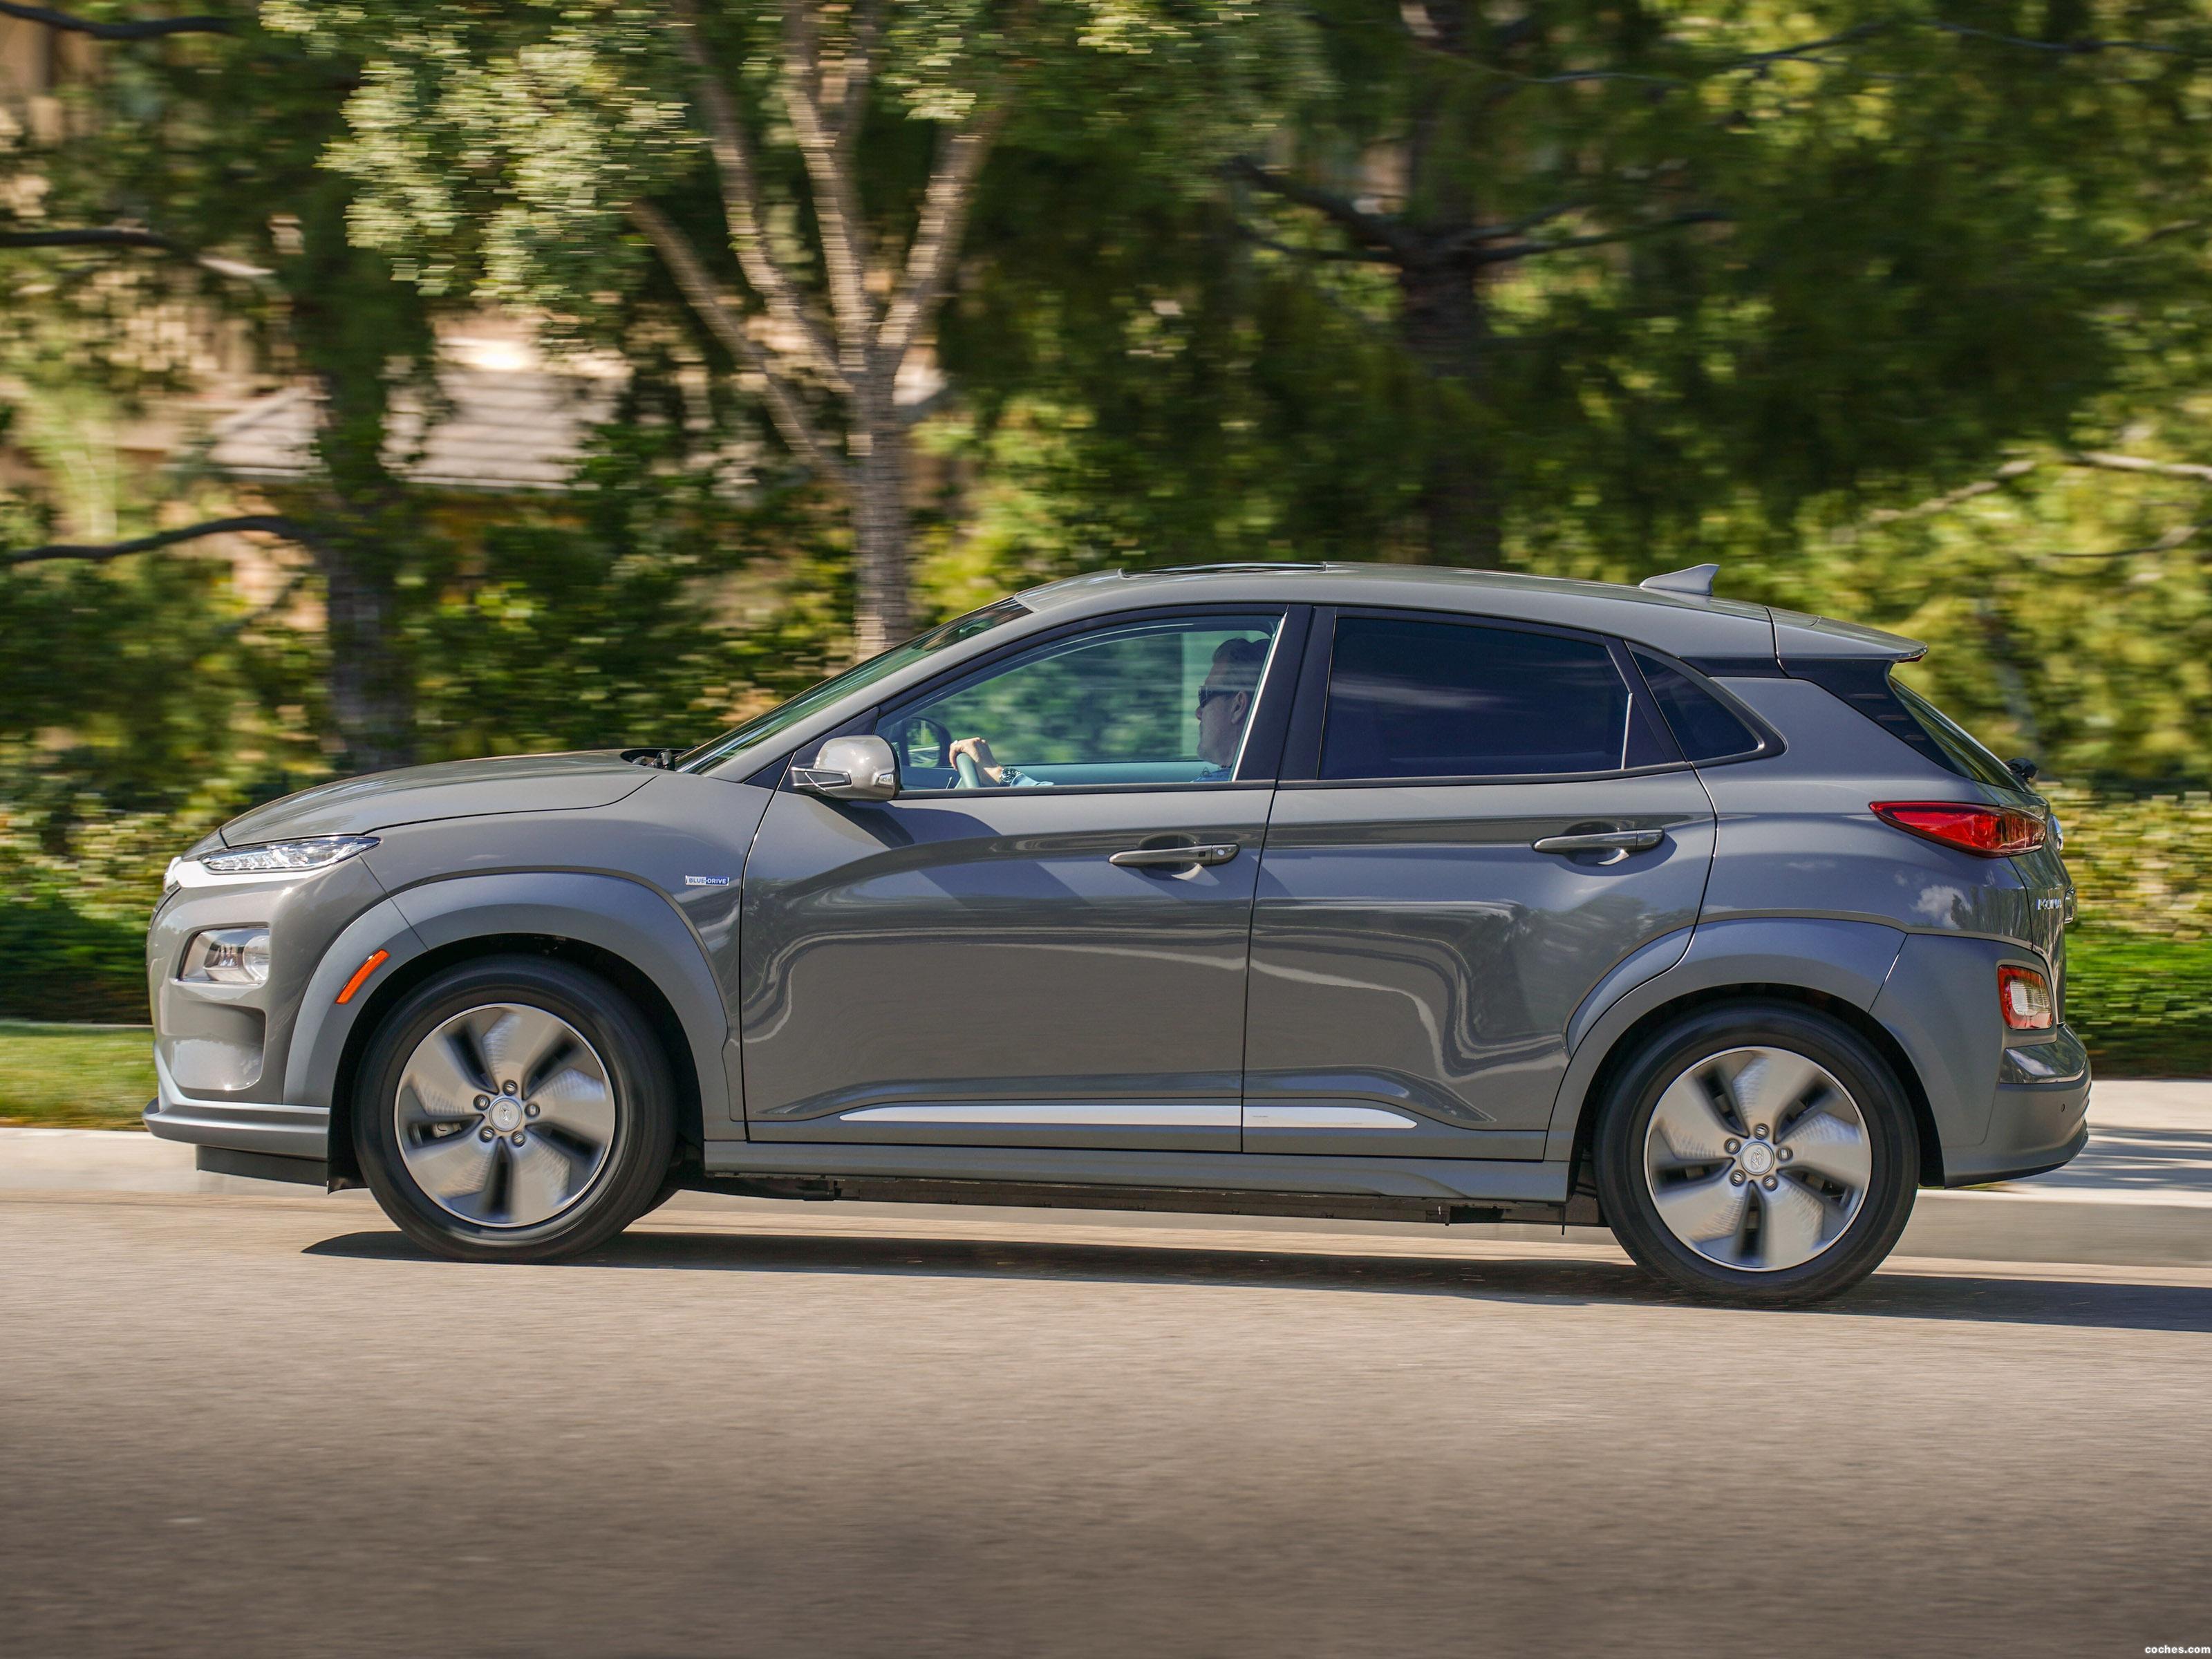 Foto 1 de Hyundai Kona Electric USA 2018